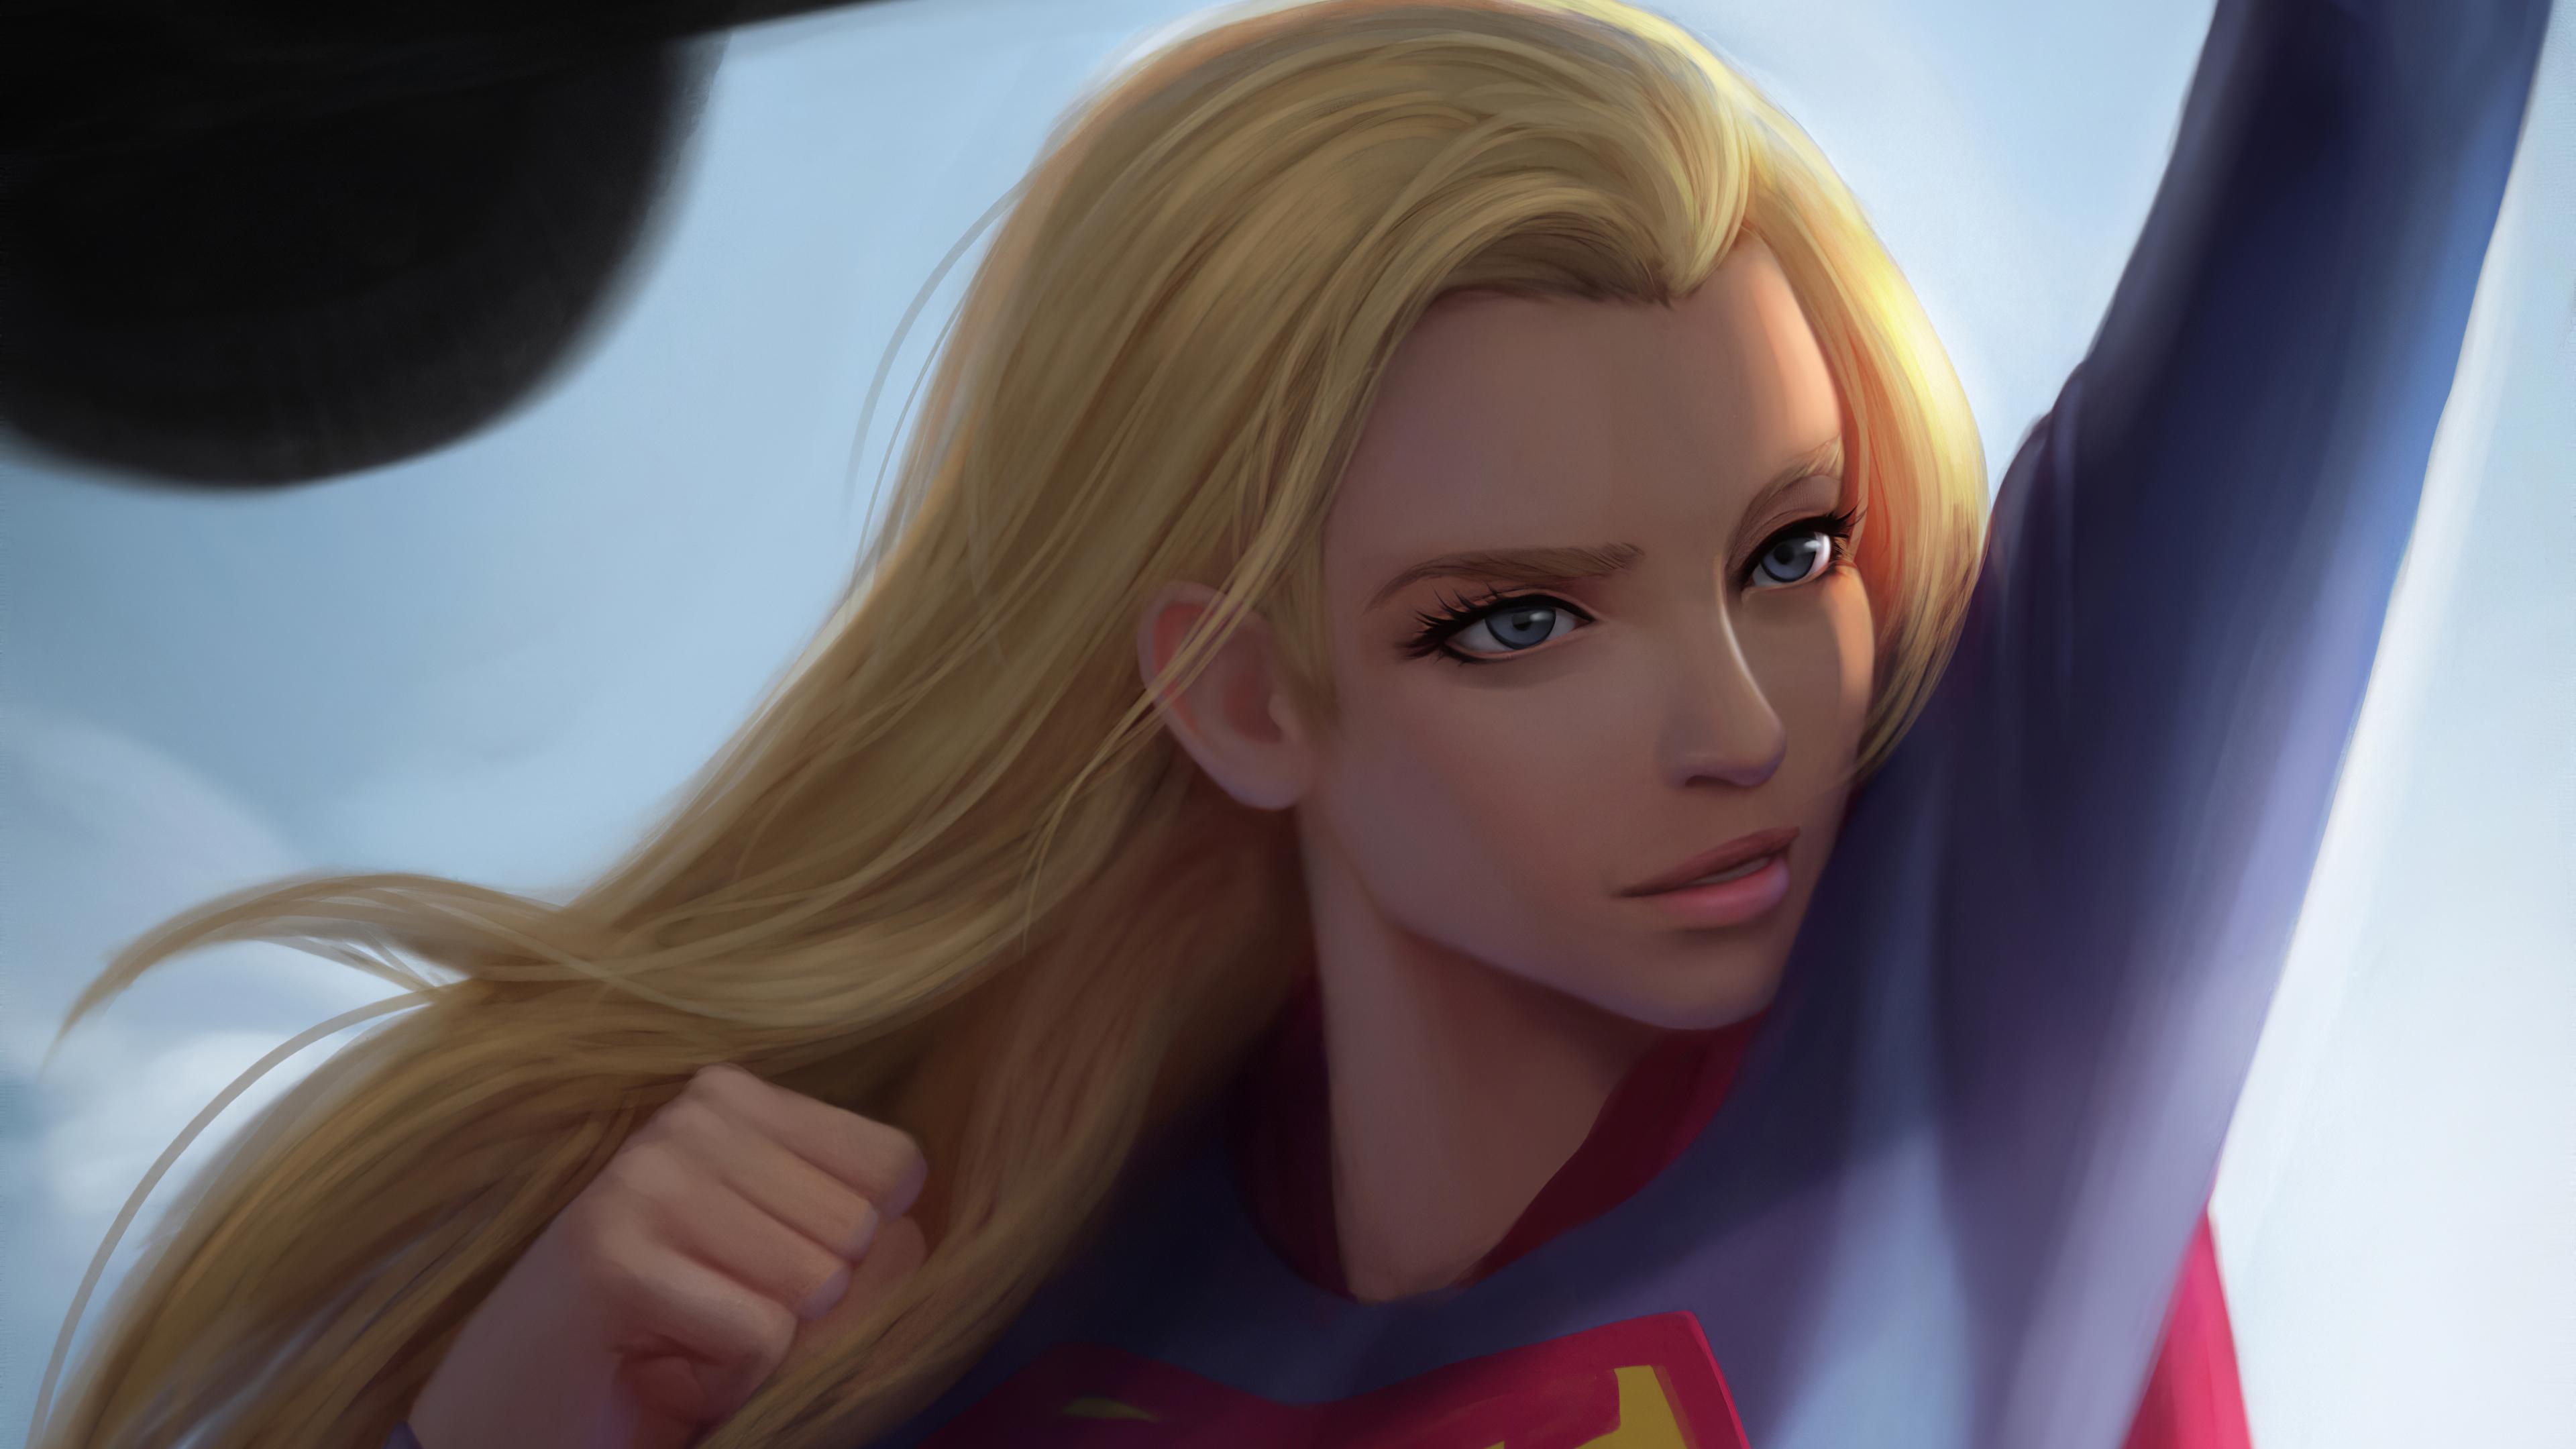 supergirl bettle art 1576091858 - Supergirl Bettle Art - Supergirl wallpaper hd 4k, supergirl art wallpaper 4k